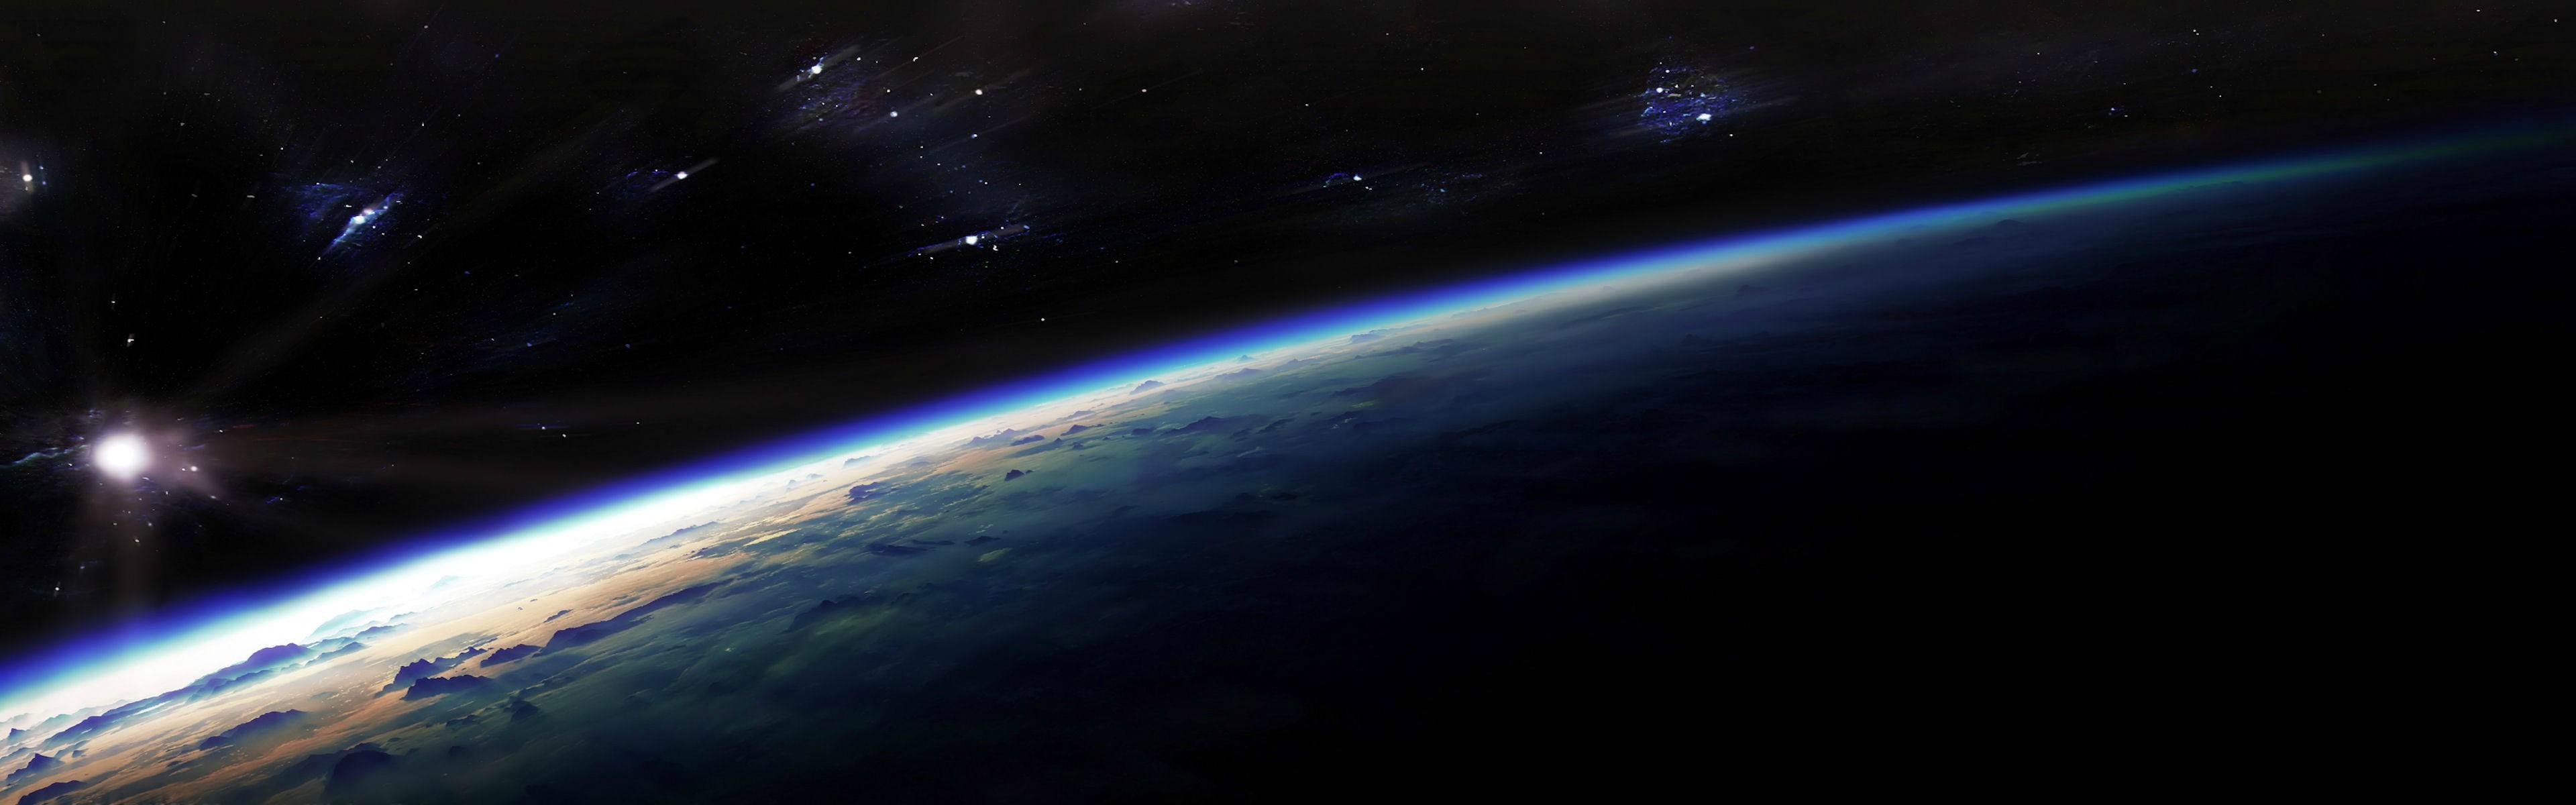 Spacey [3480x1200] iimgurcom 3840x1200